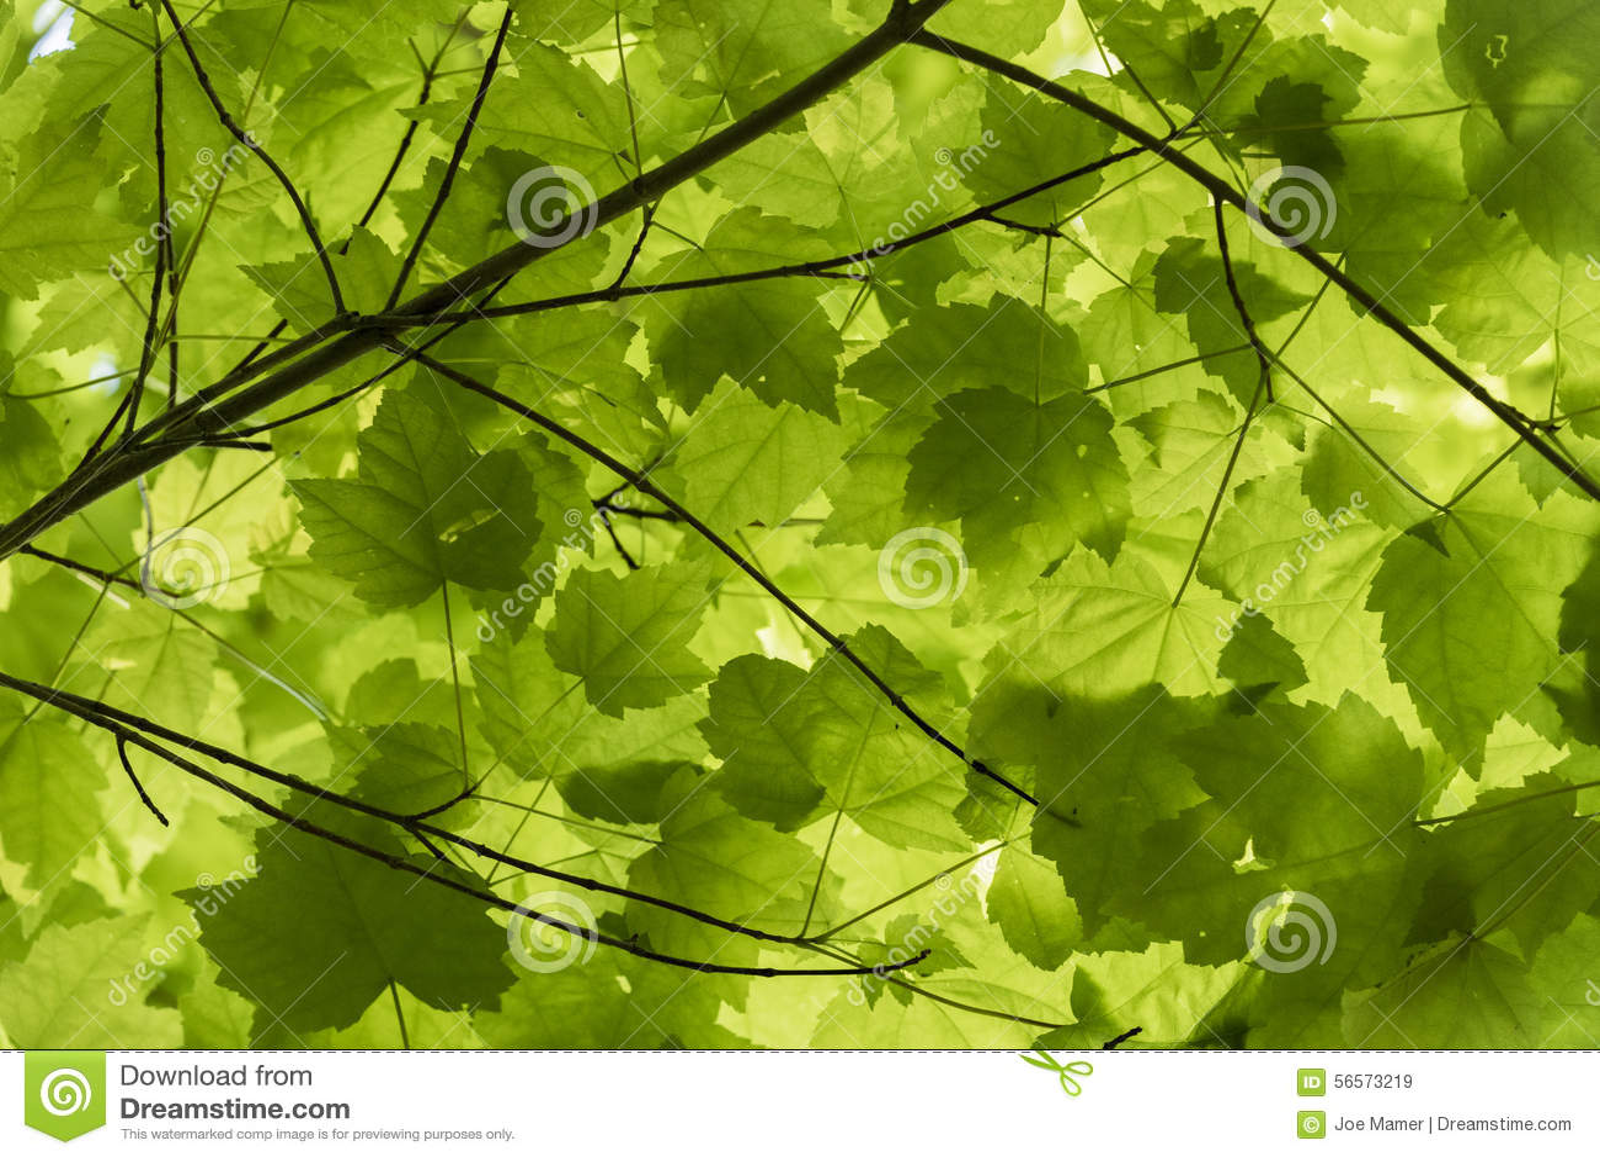 Download Πράσινος θόλος φύλλων σφενδάμου Στοκ Εικόνα - εικόνα από πράσινος, πολλοί: 56573219